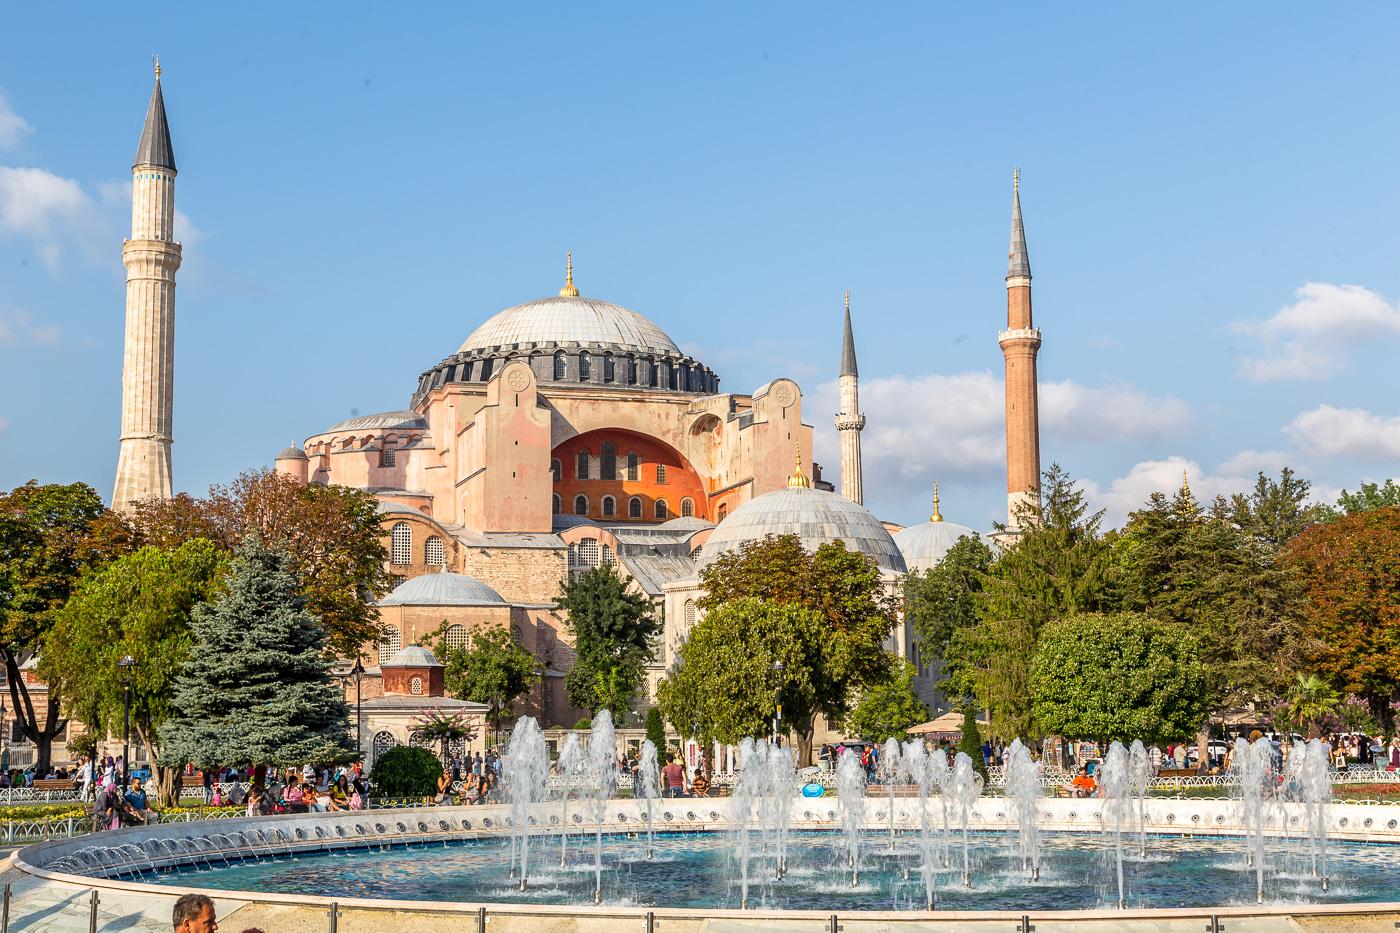 Hagia-Sophia-Mosque معرفی بهترین جاذبه های گردشگری ترابزون ترکیه | قسمت اول